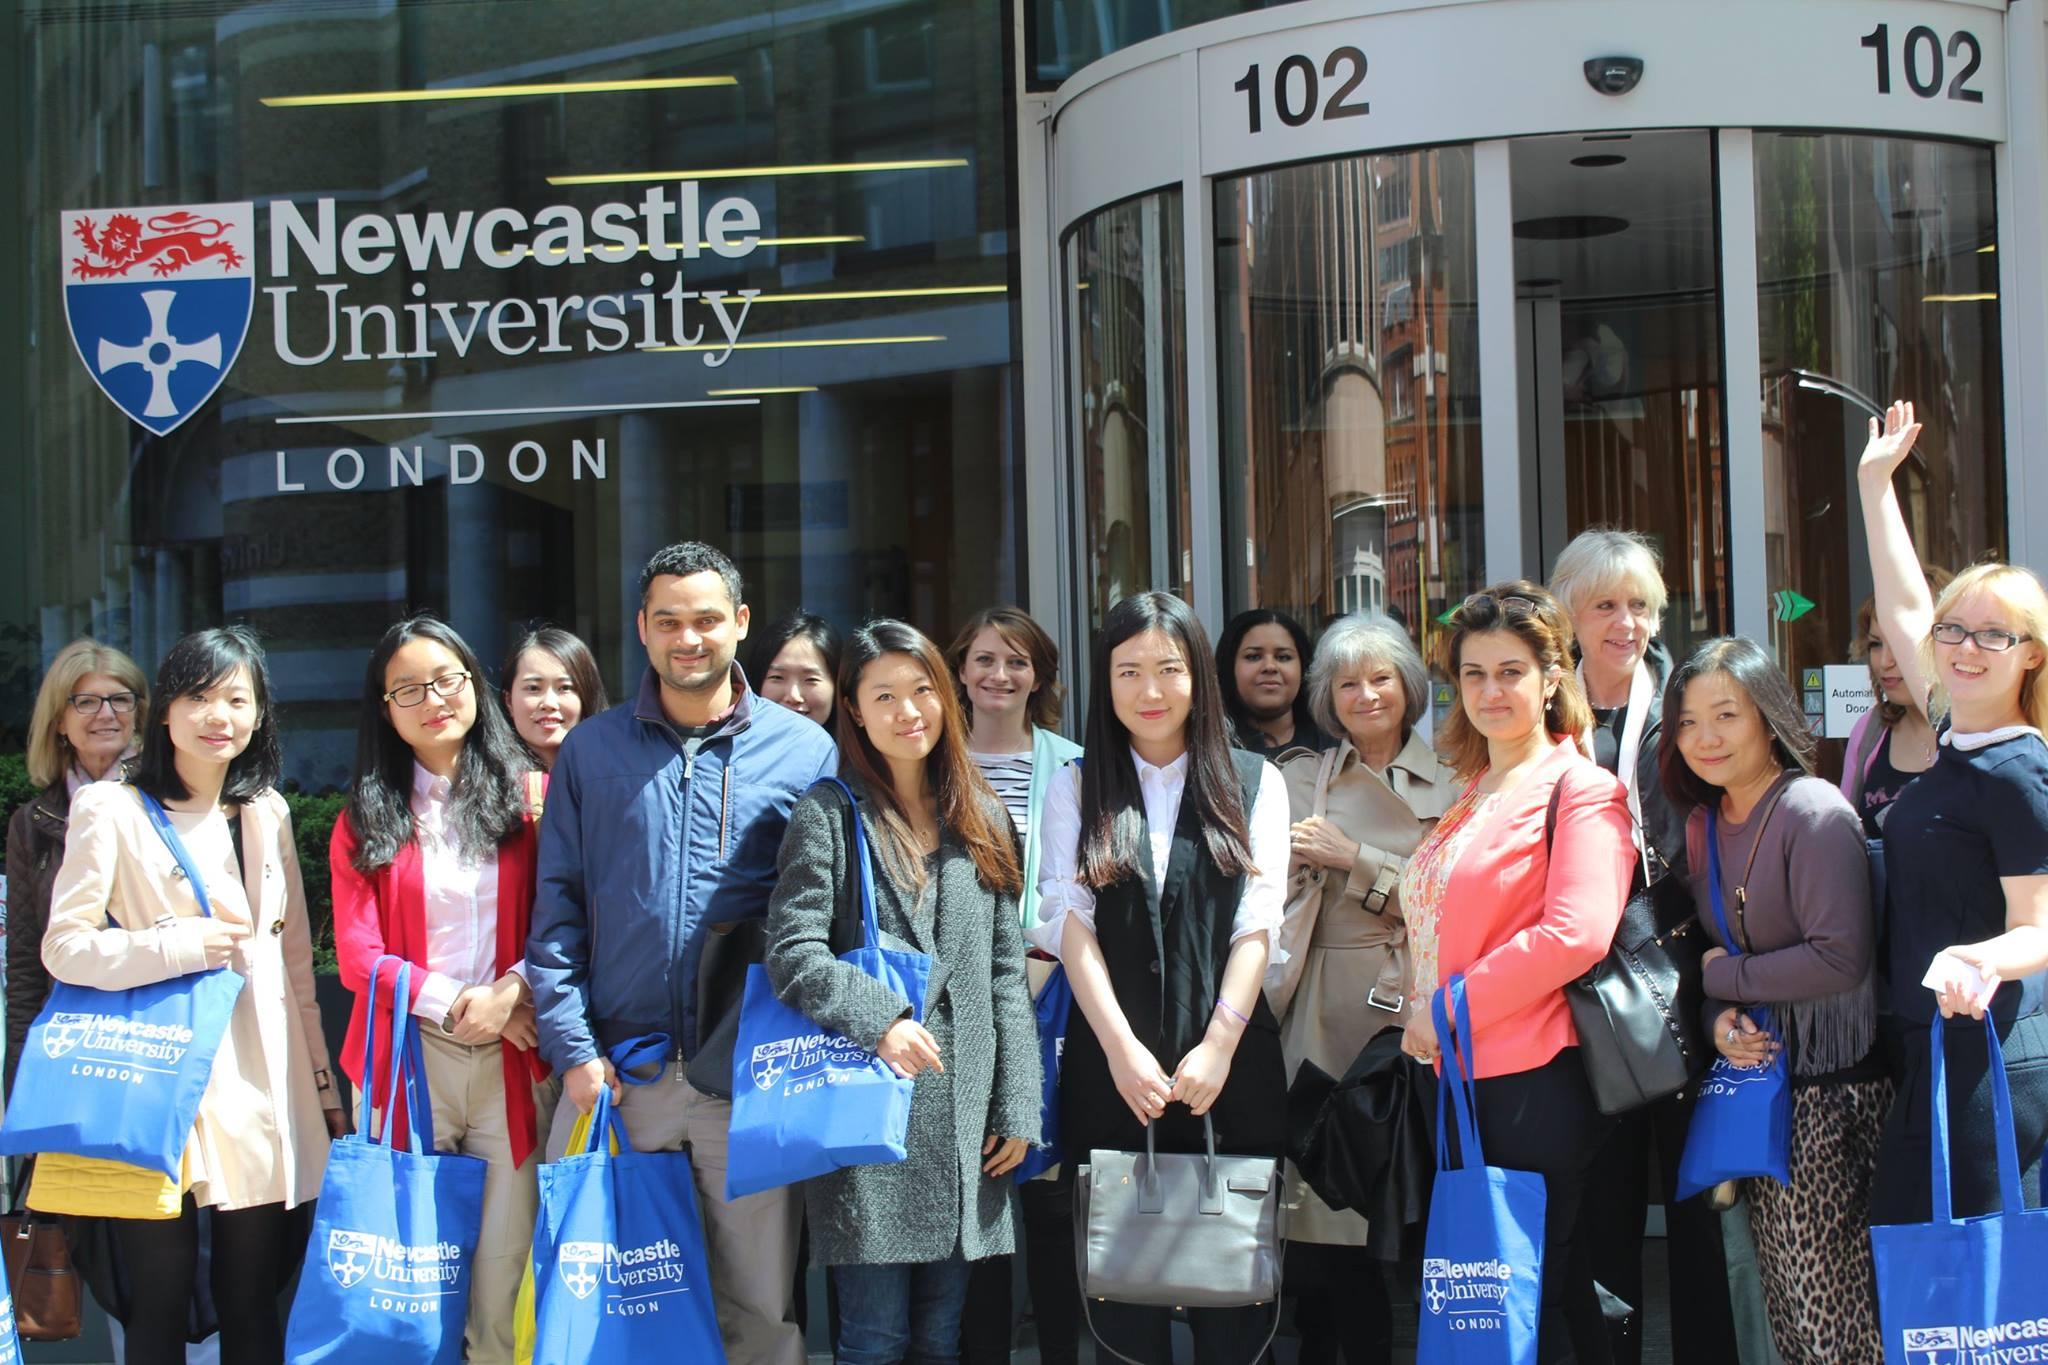 1-newcastle-university-london-du-hoc-anh